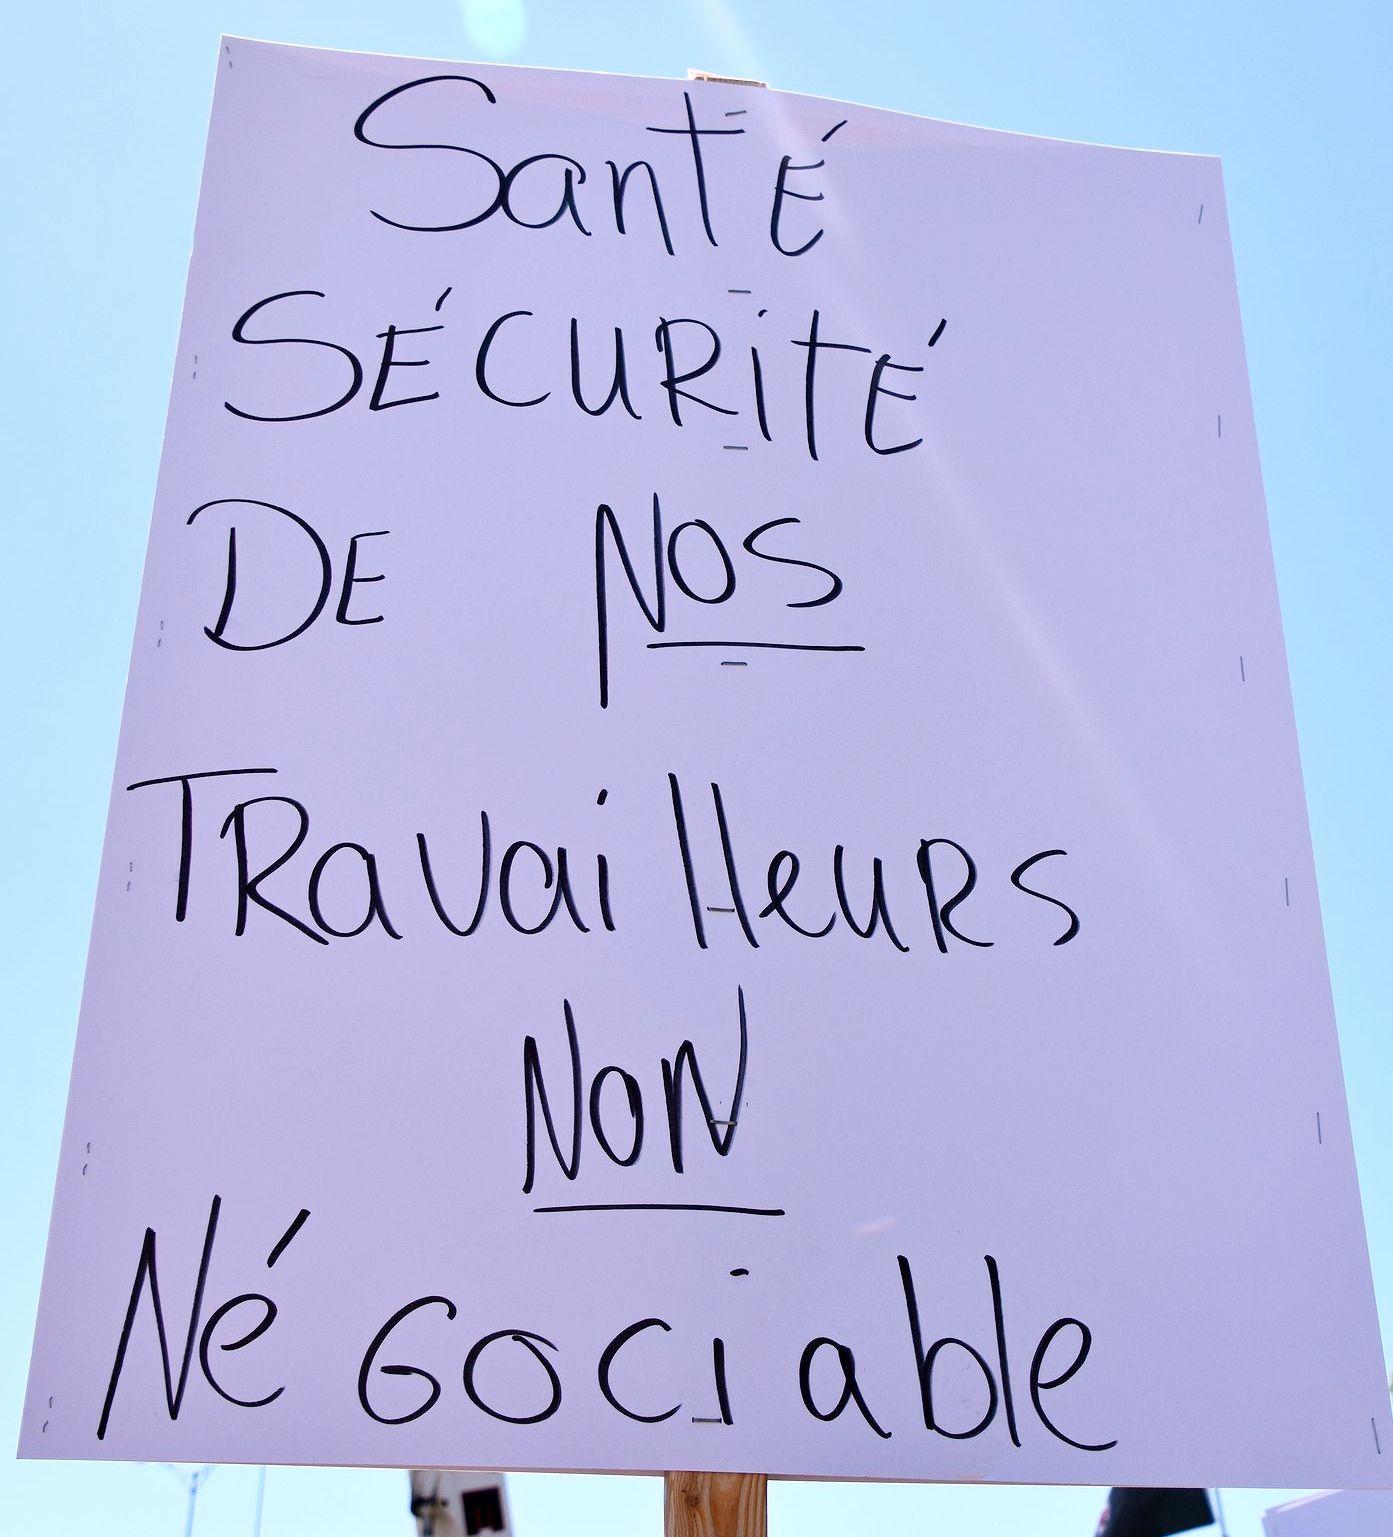 http://www.cpcml.ca/images2019/WorkersEconomy/Construction/File/180621-MTL-Grutiers-05.jpg